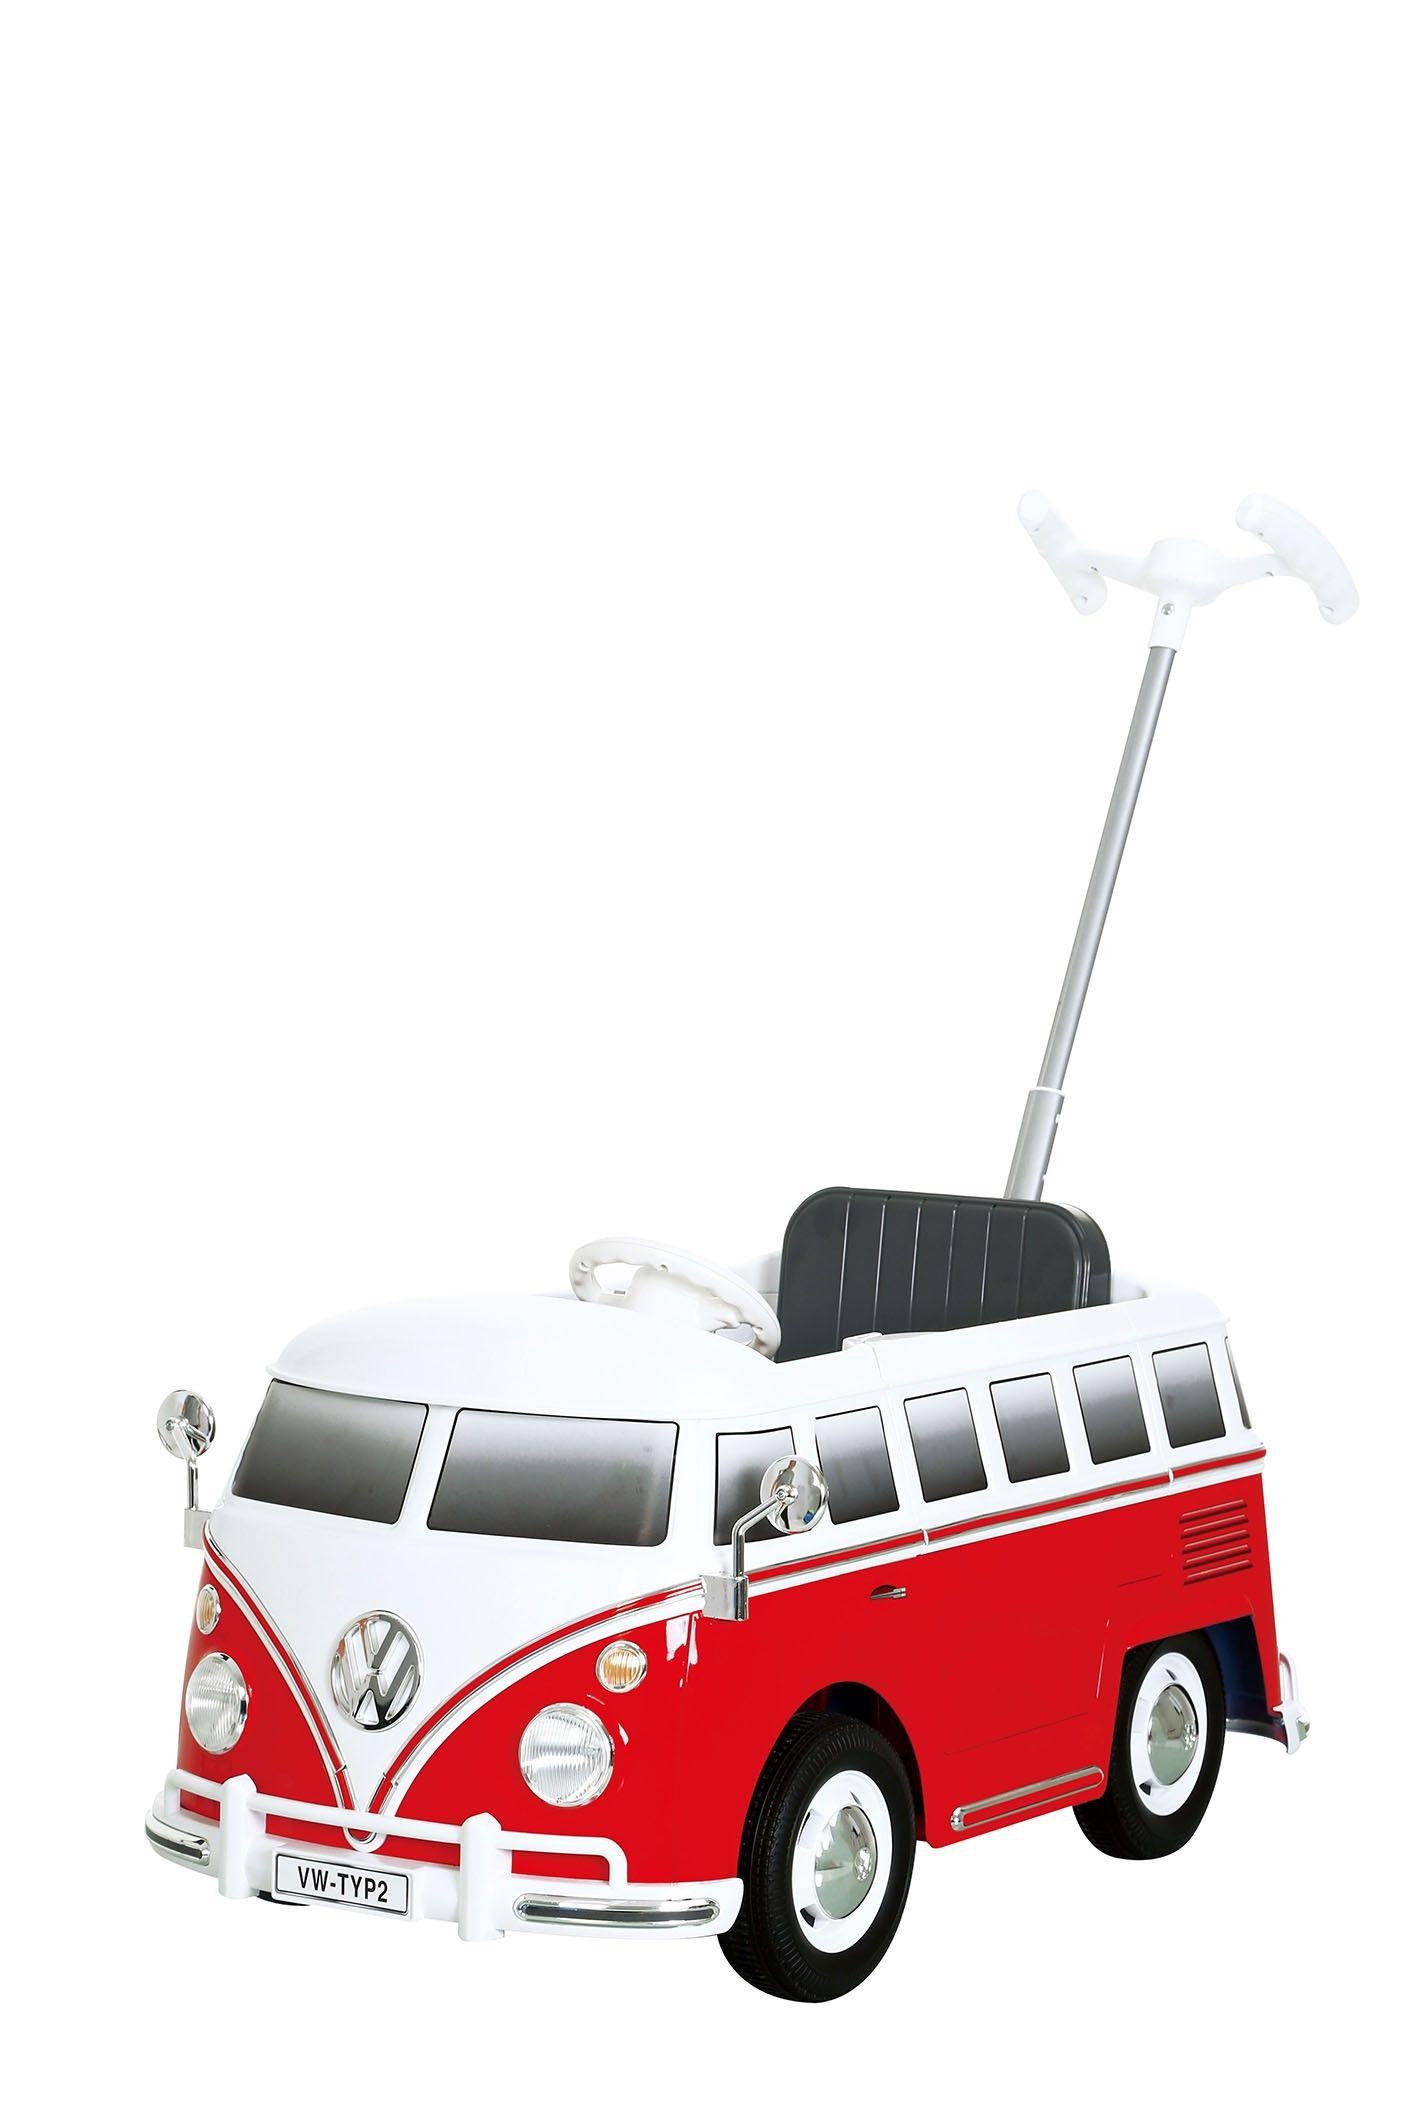 VW MINI BUS PUSH CAR